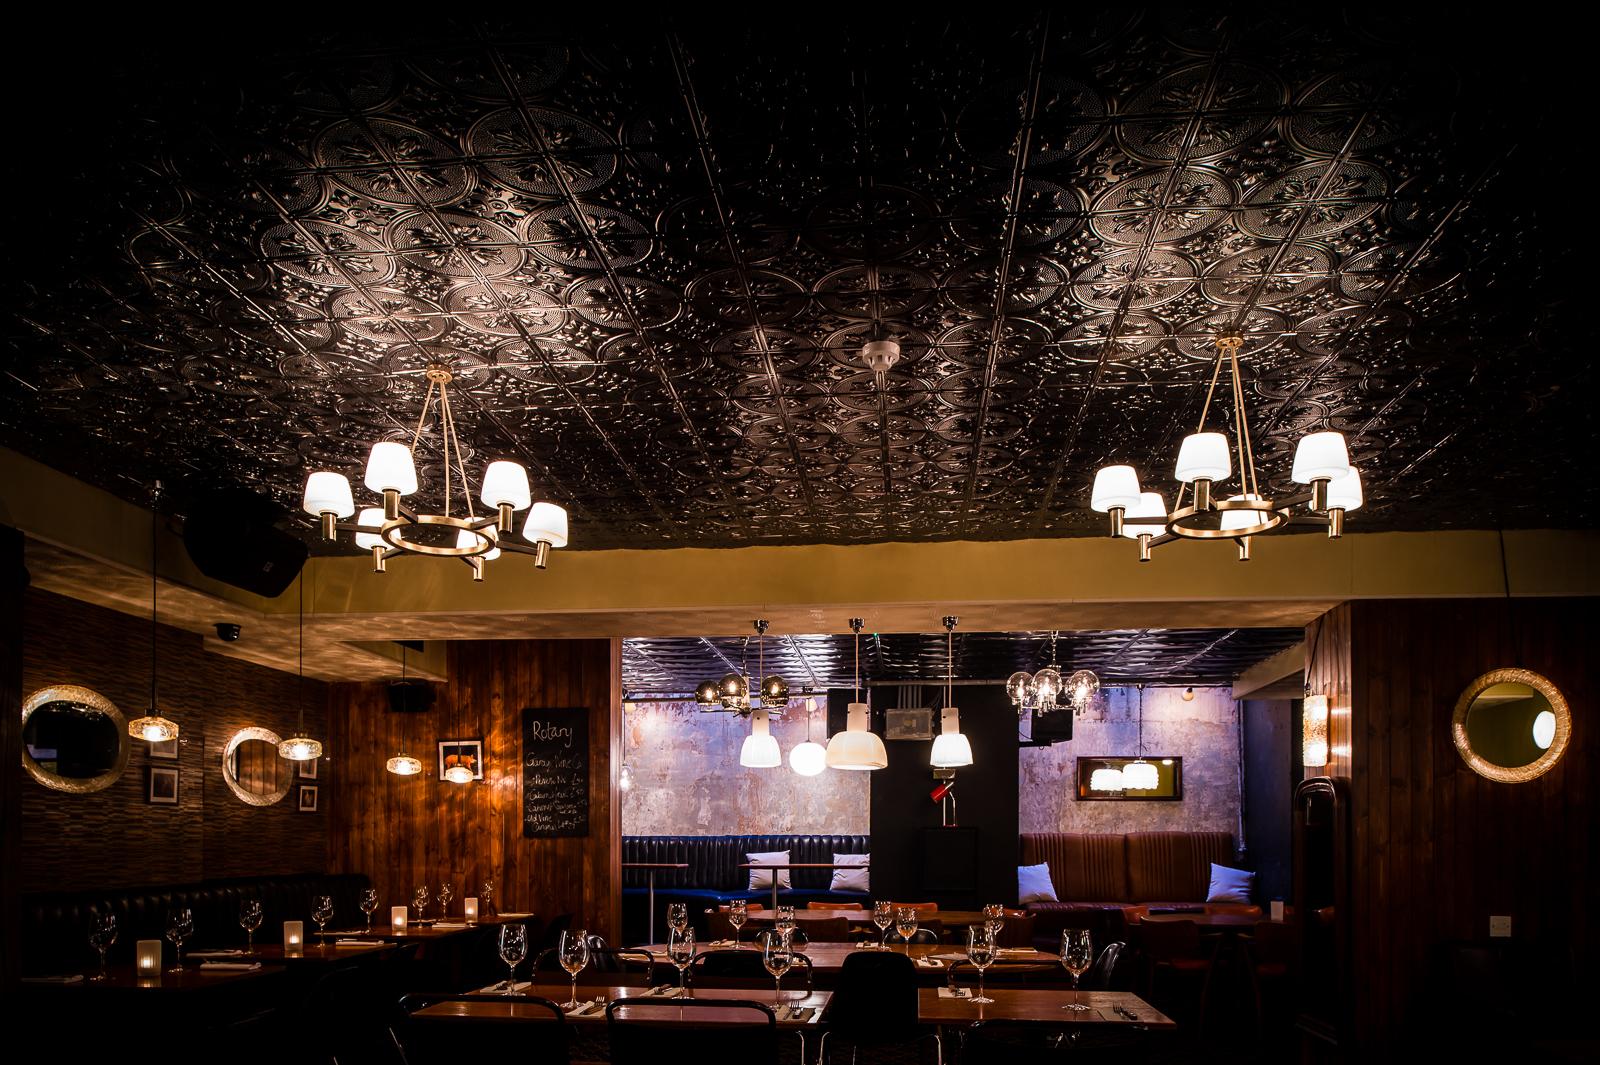 Rotary Bar & Diner